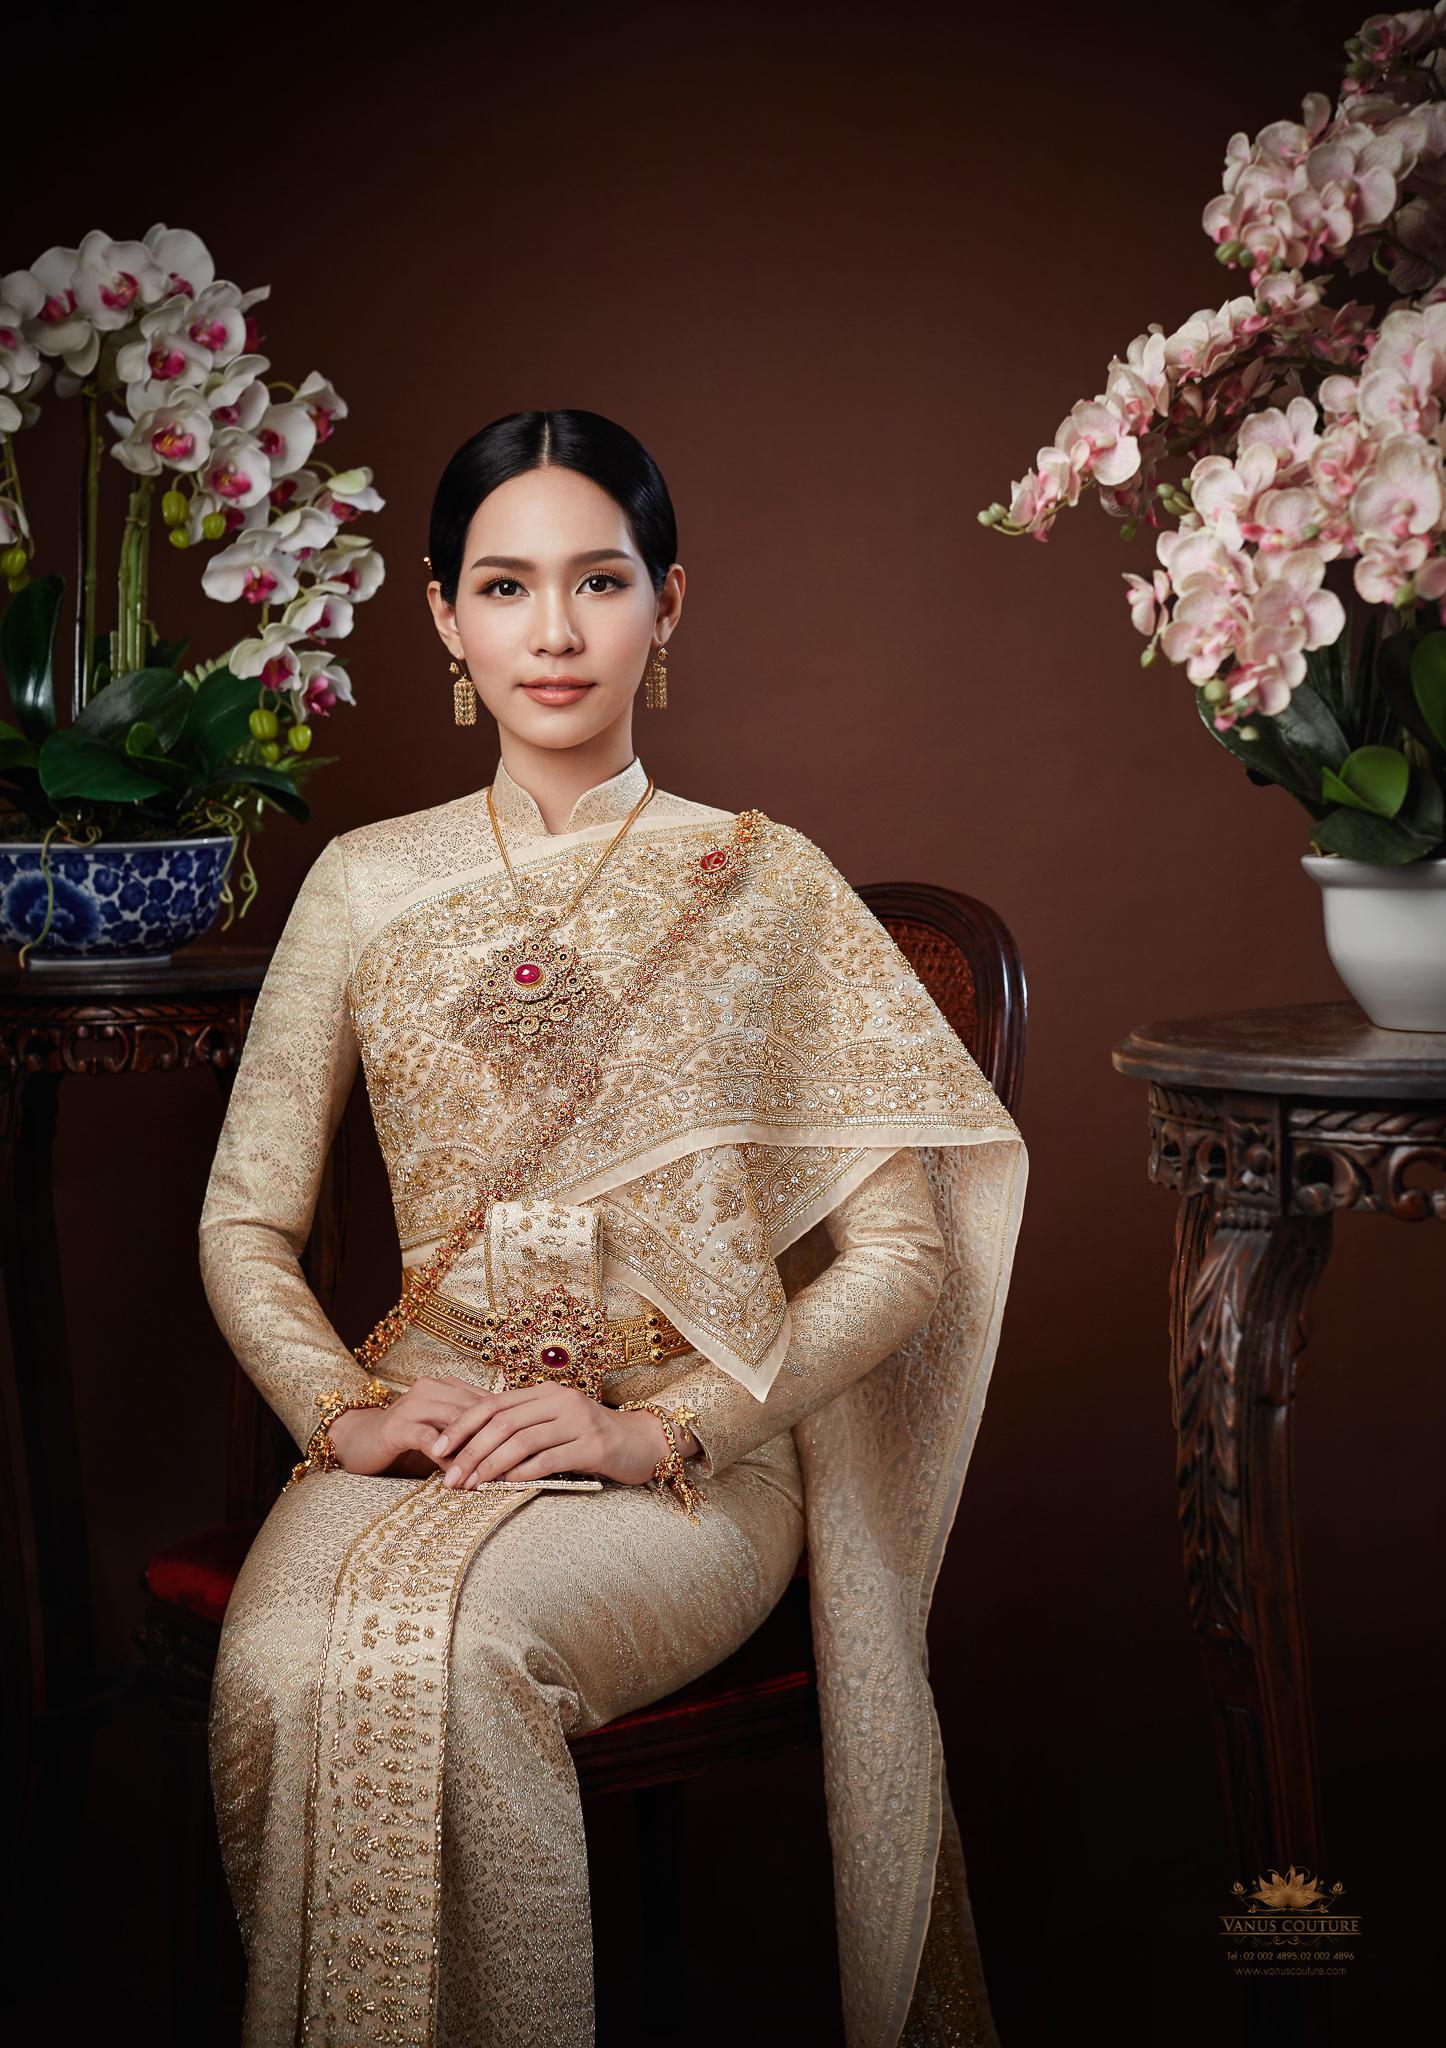 Thai traditional dress - Bint 07